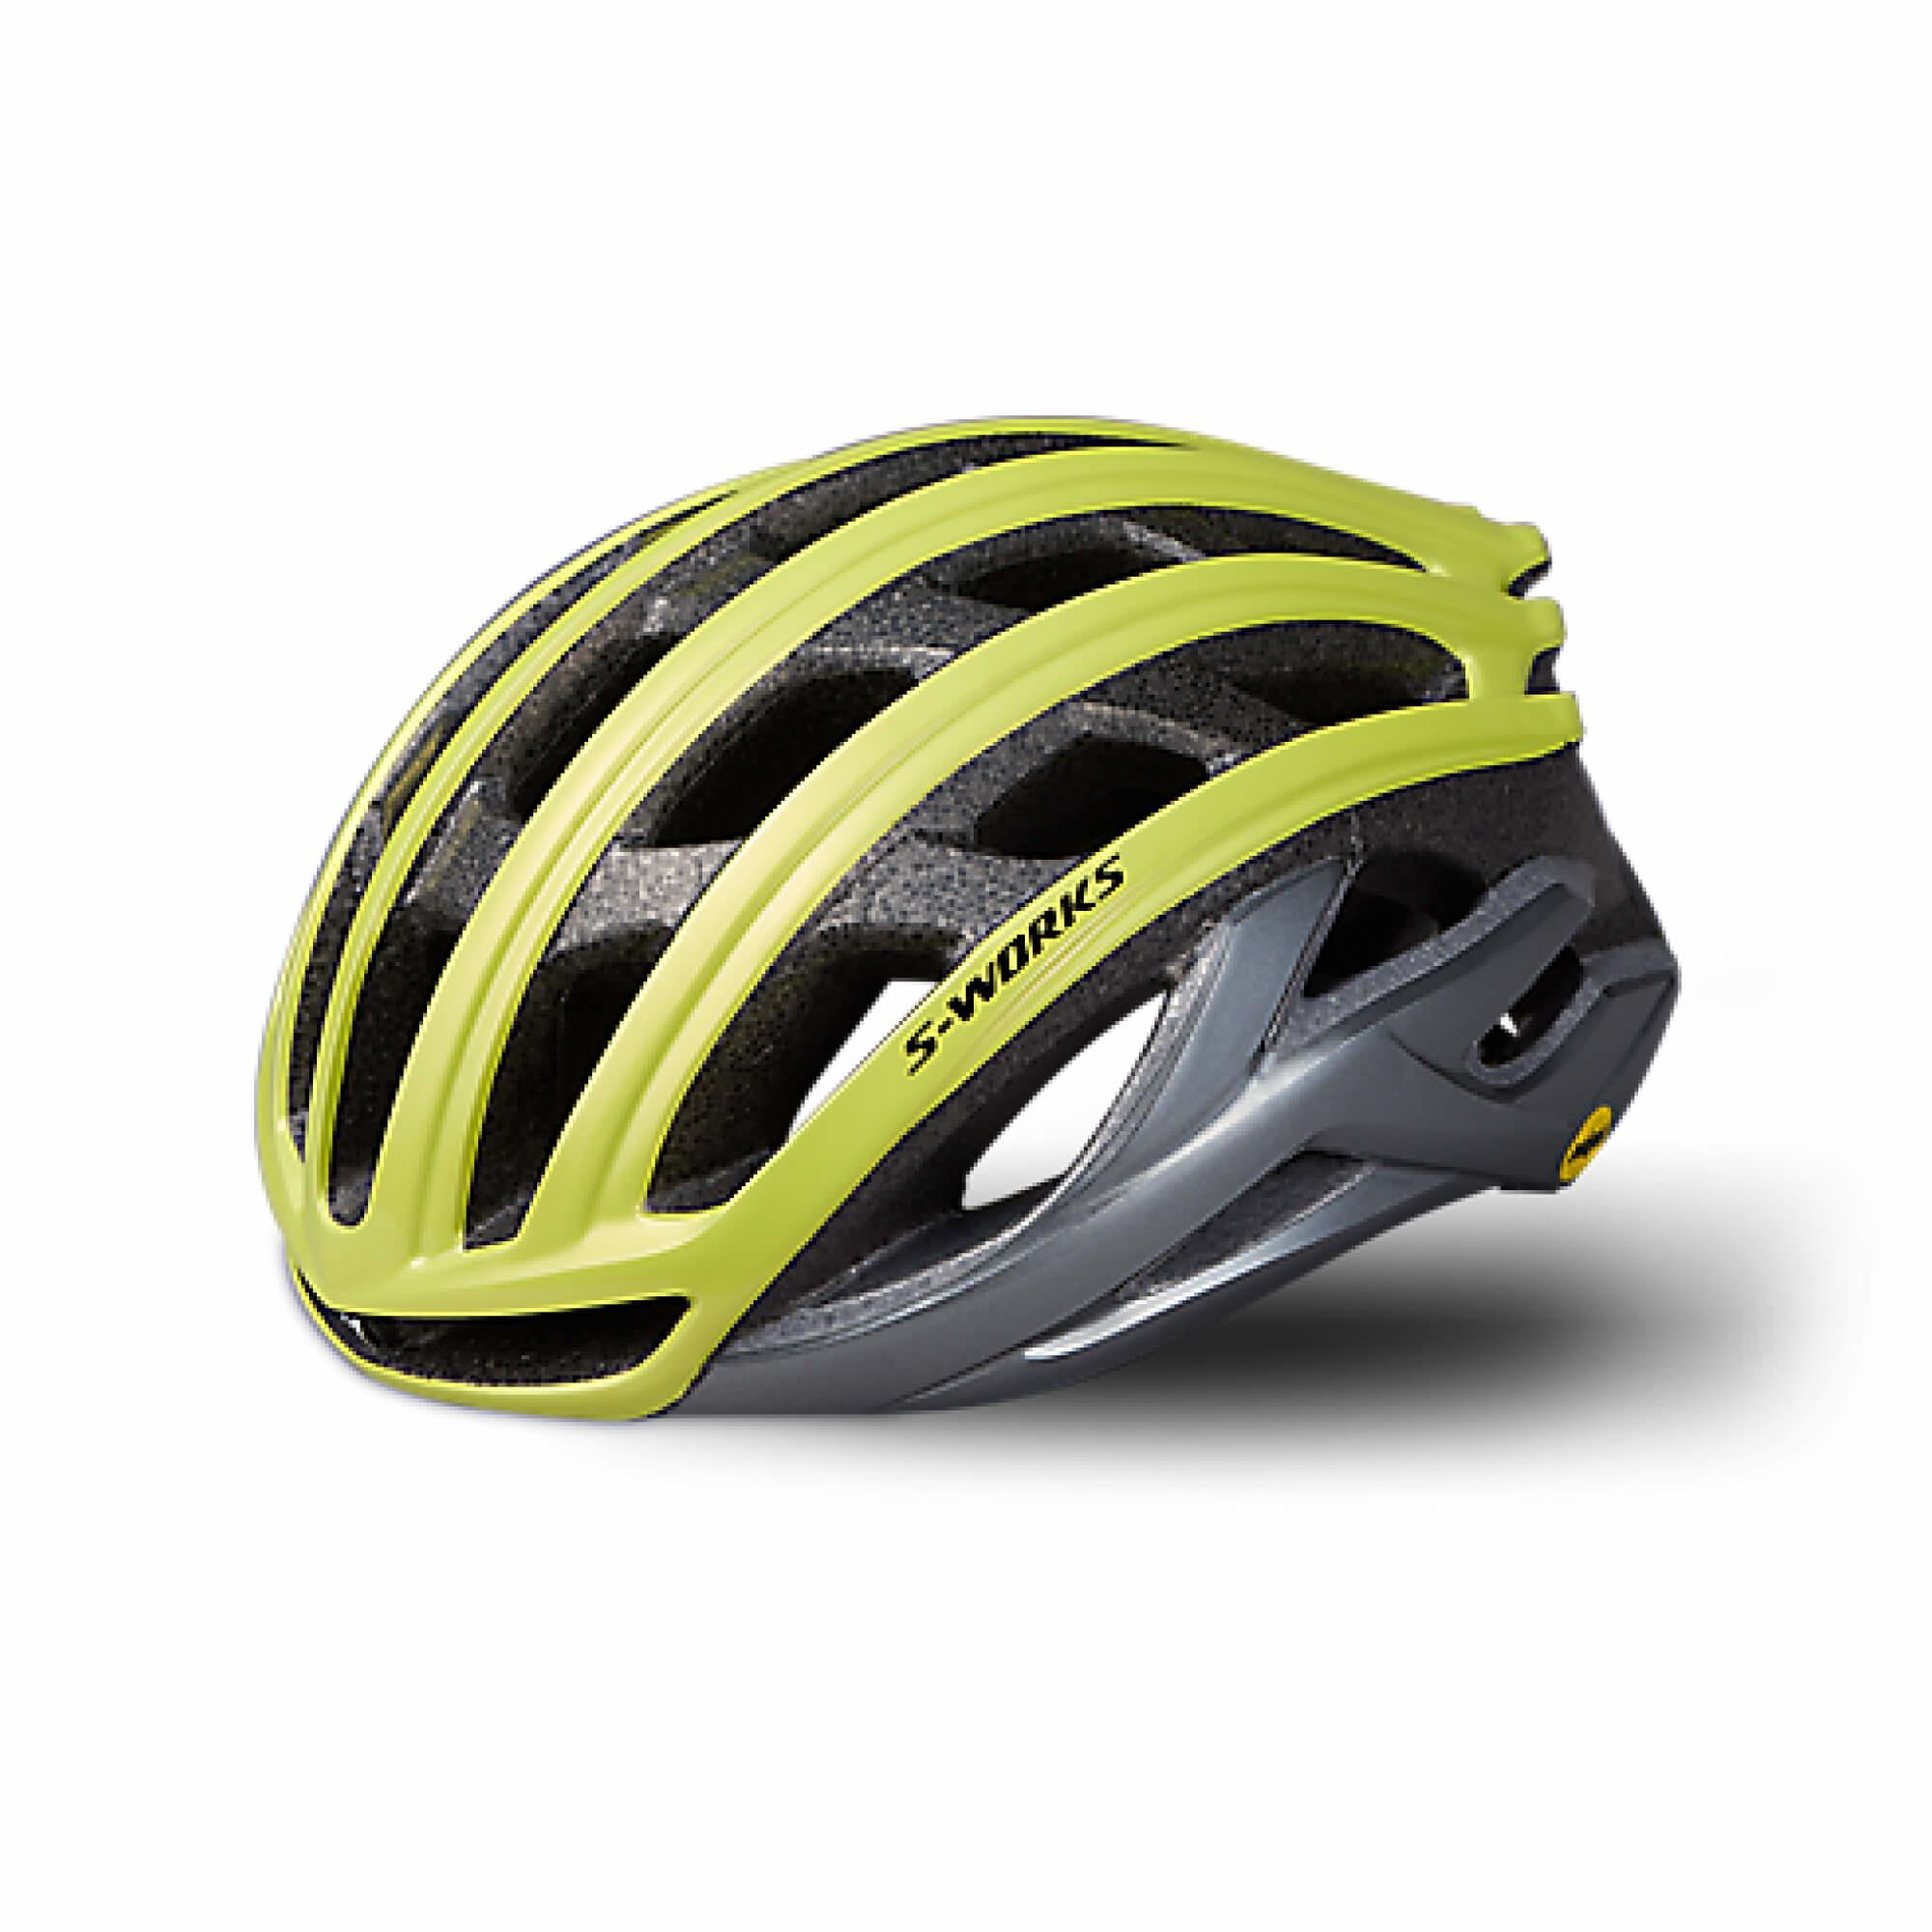 S-Works Prevail II Helmet Angi Mips 2019-2020-4